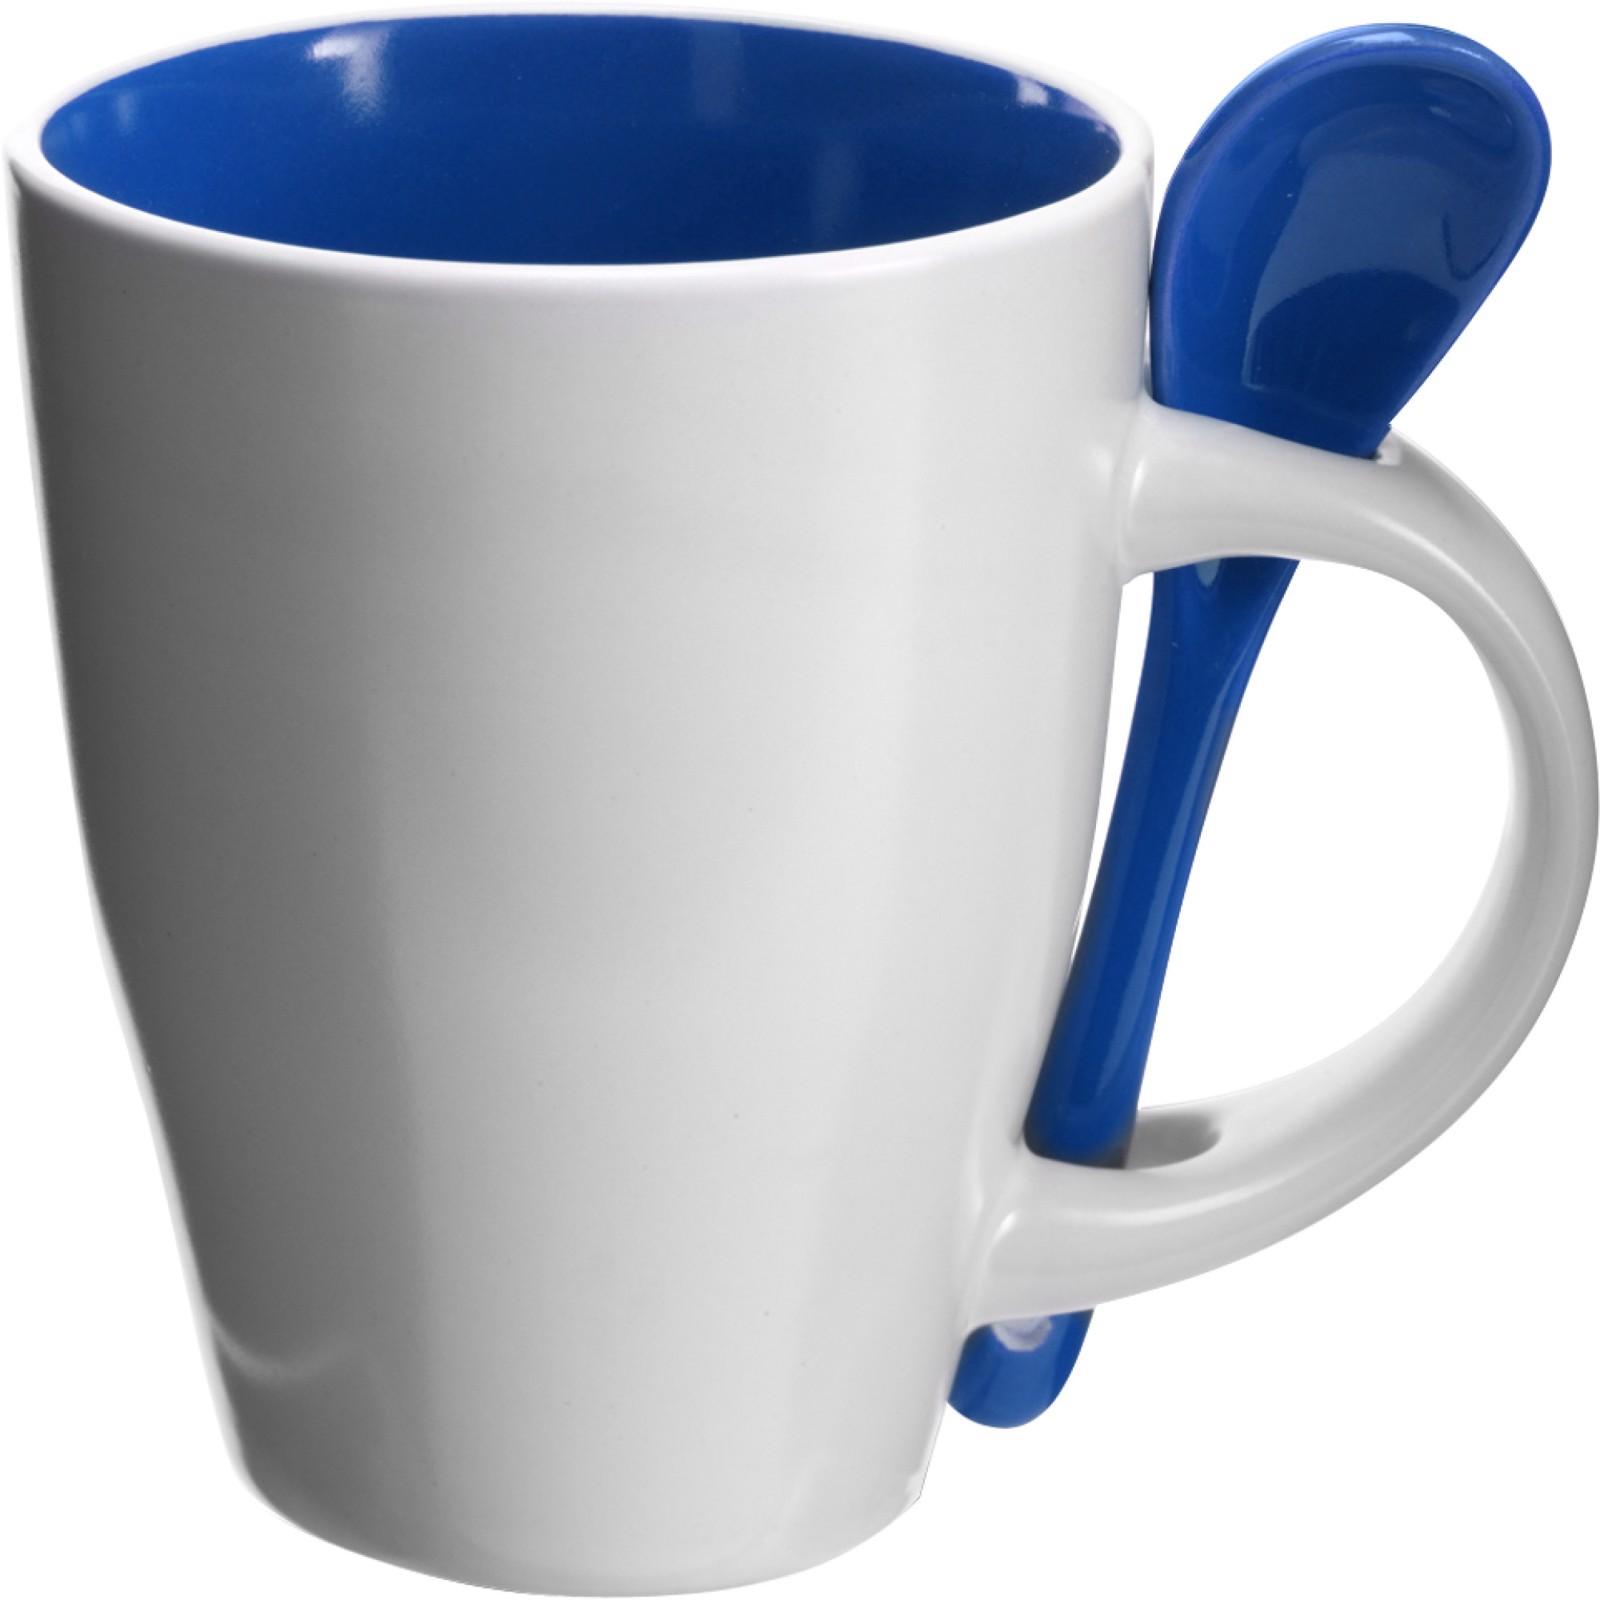 Ceramic mug with spoon - Blue